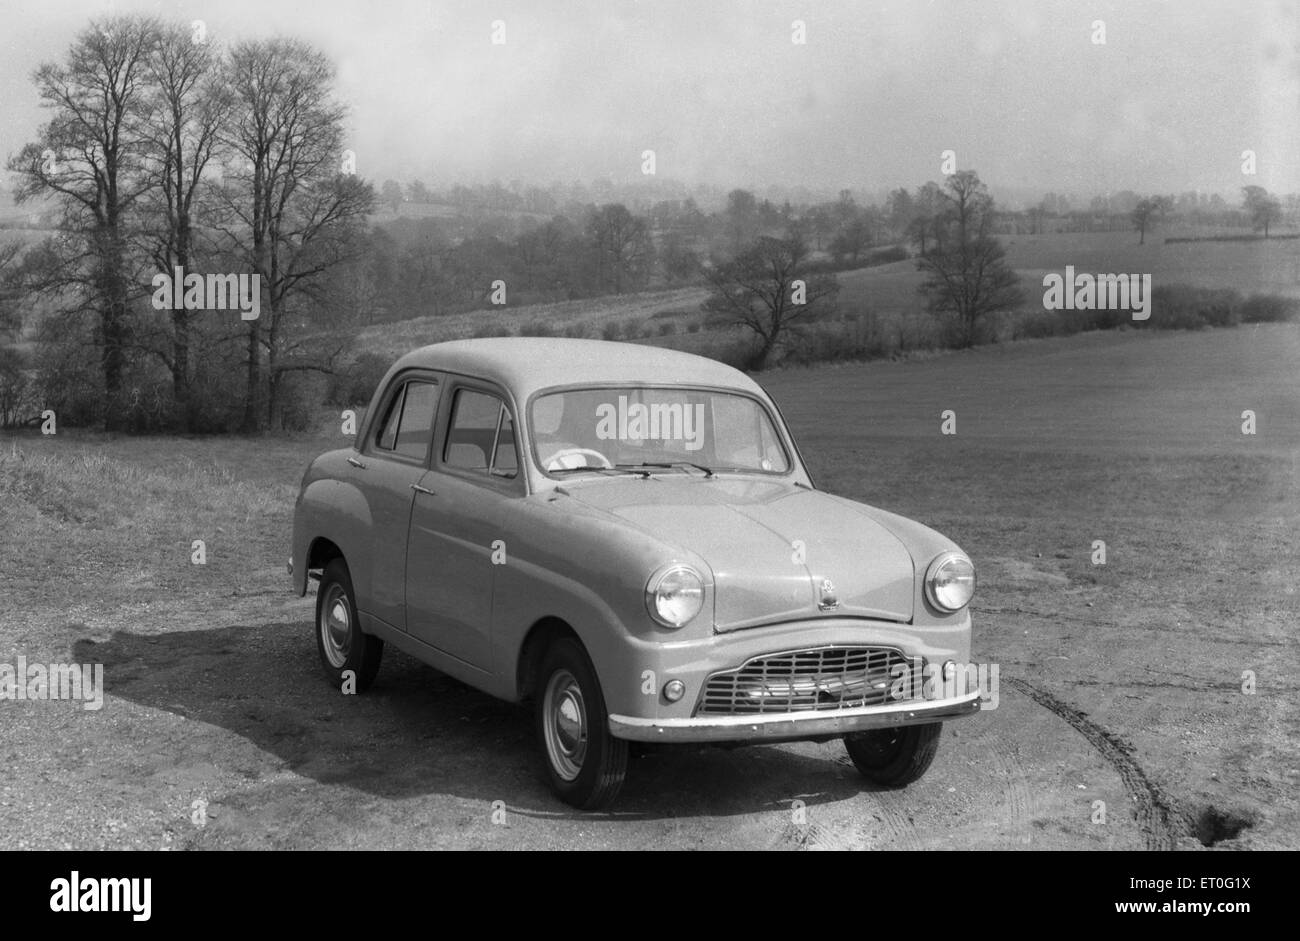 The new Standard 8 Gold Star model car Circa 1957 - Stock Image